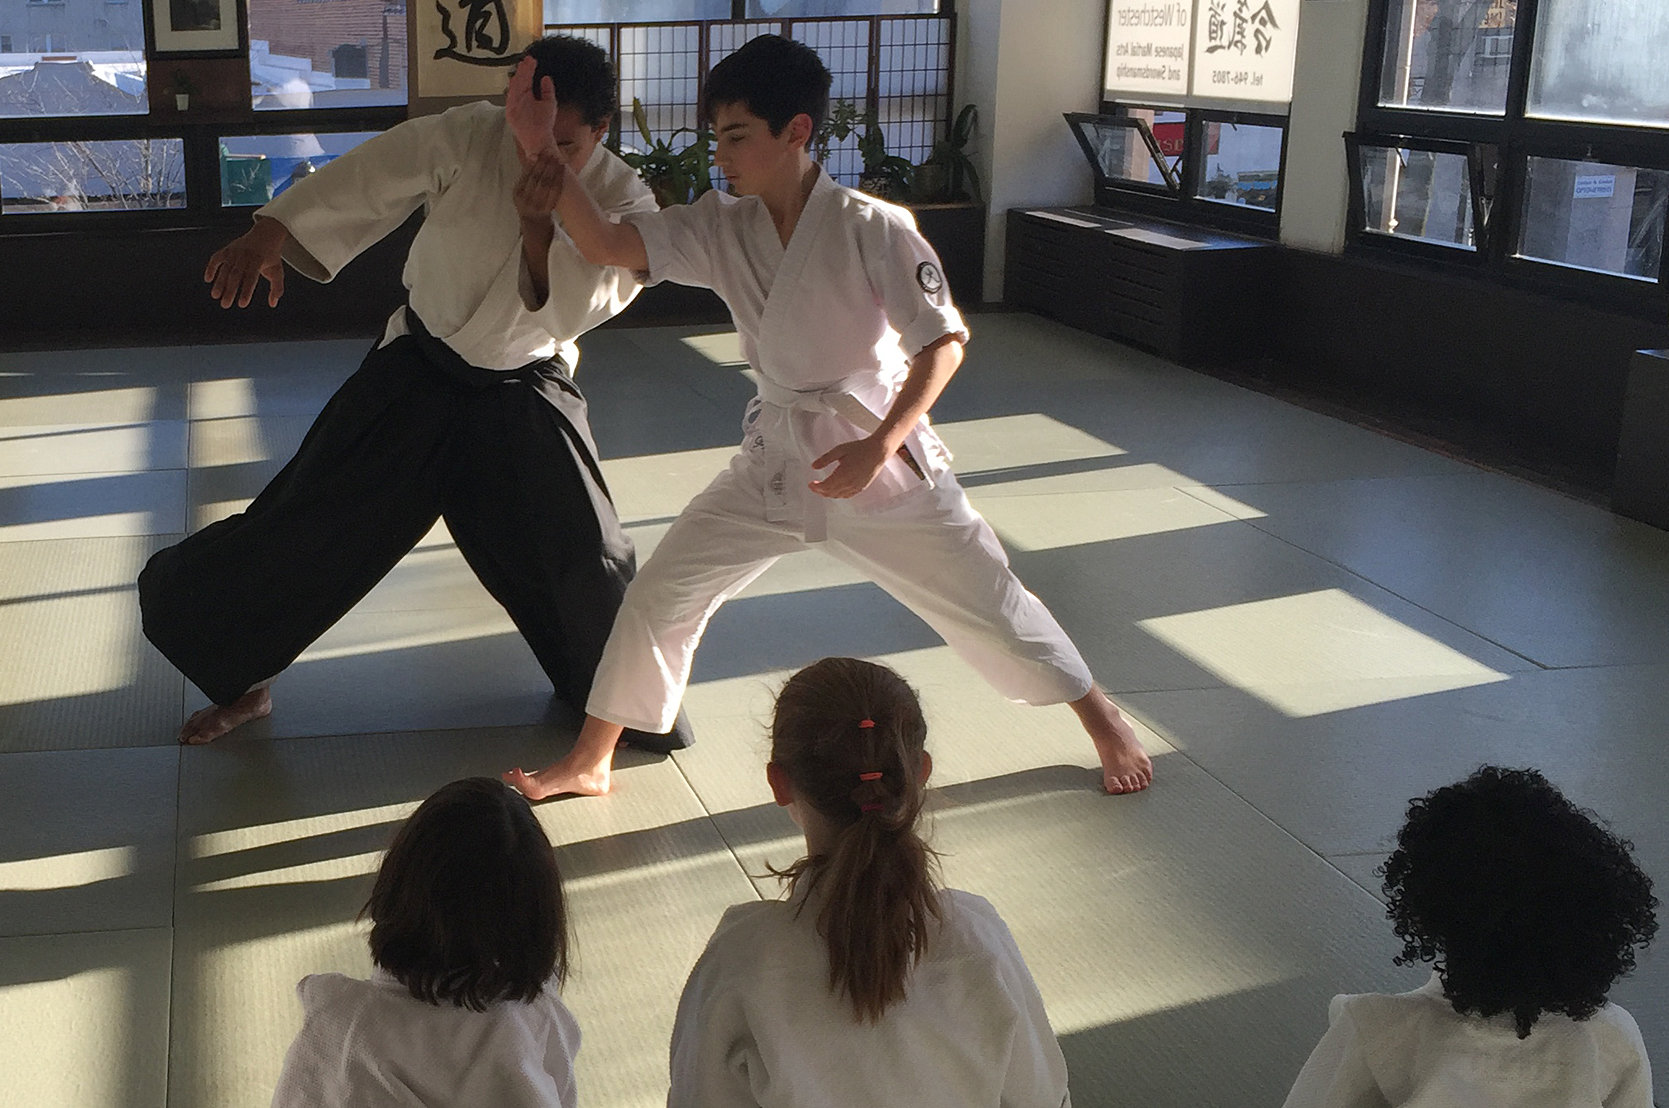 1_kids_aikido-westchester-ny.jpg